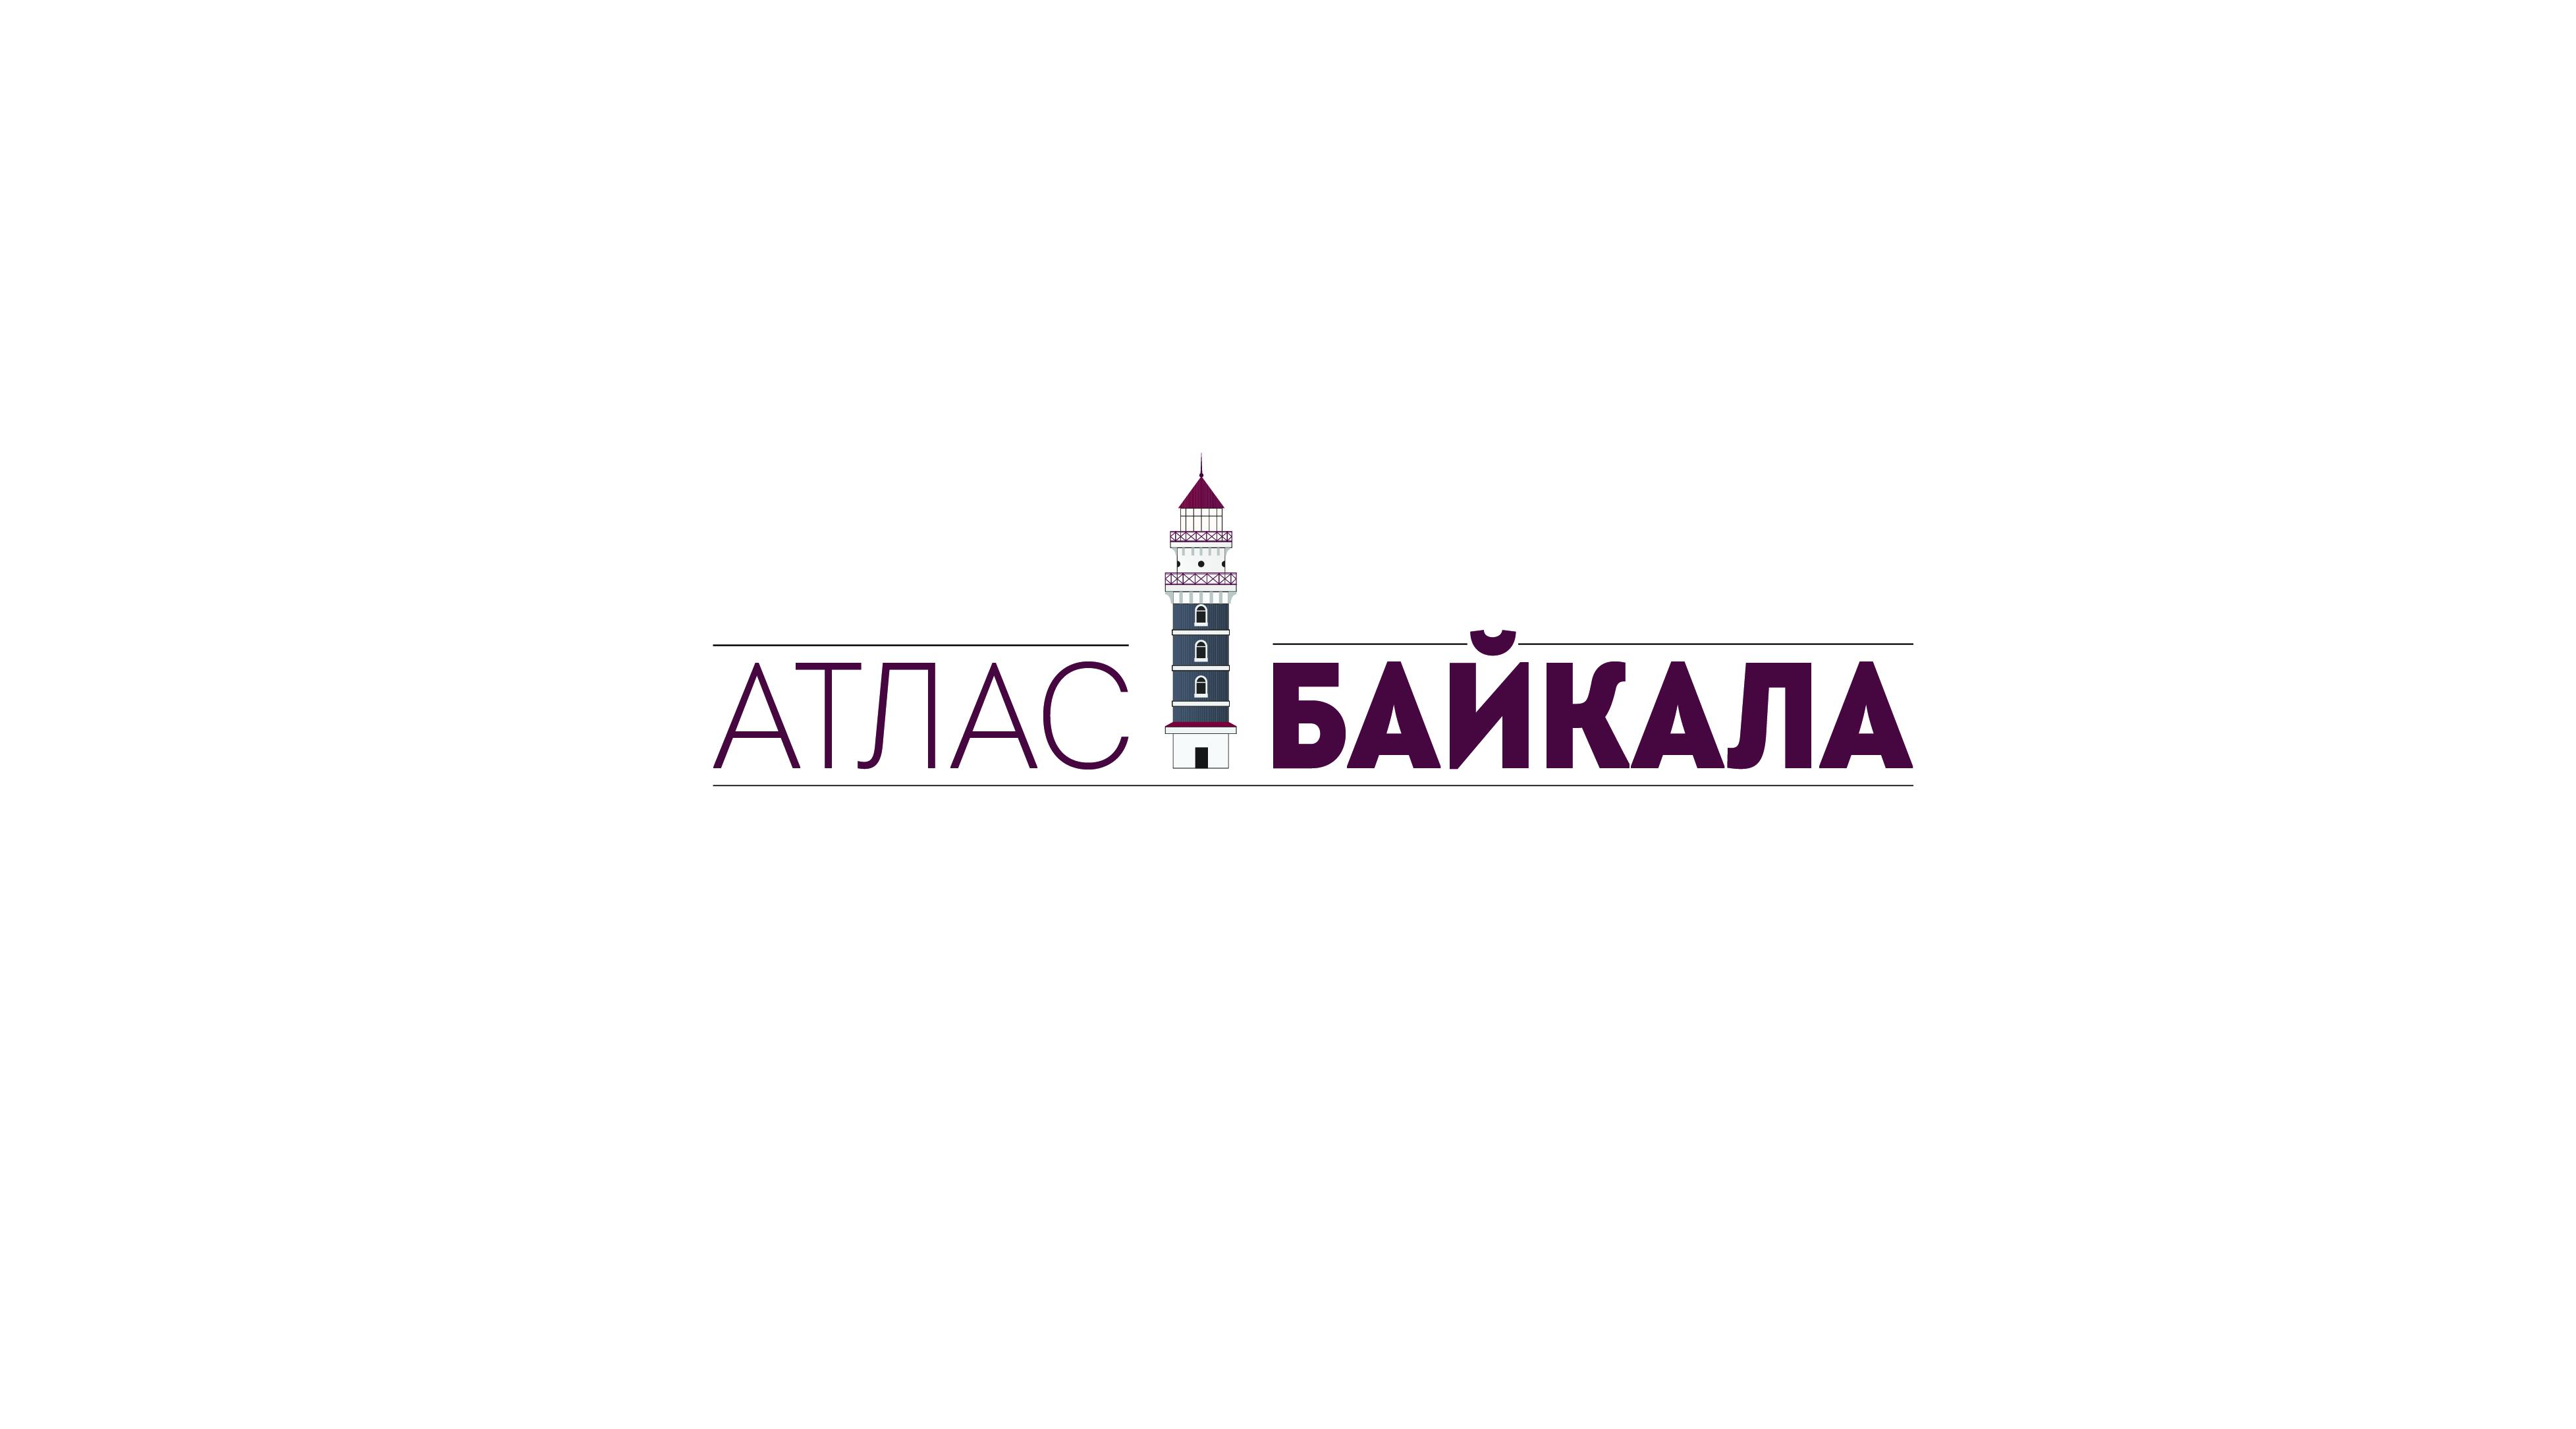 Разработка логотипа Атлас Байкала фото f_9995b02c1a14ae7b.jpg